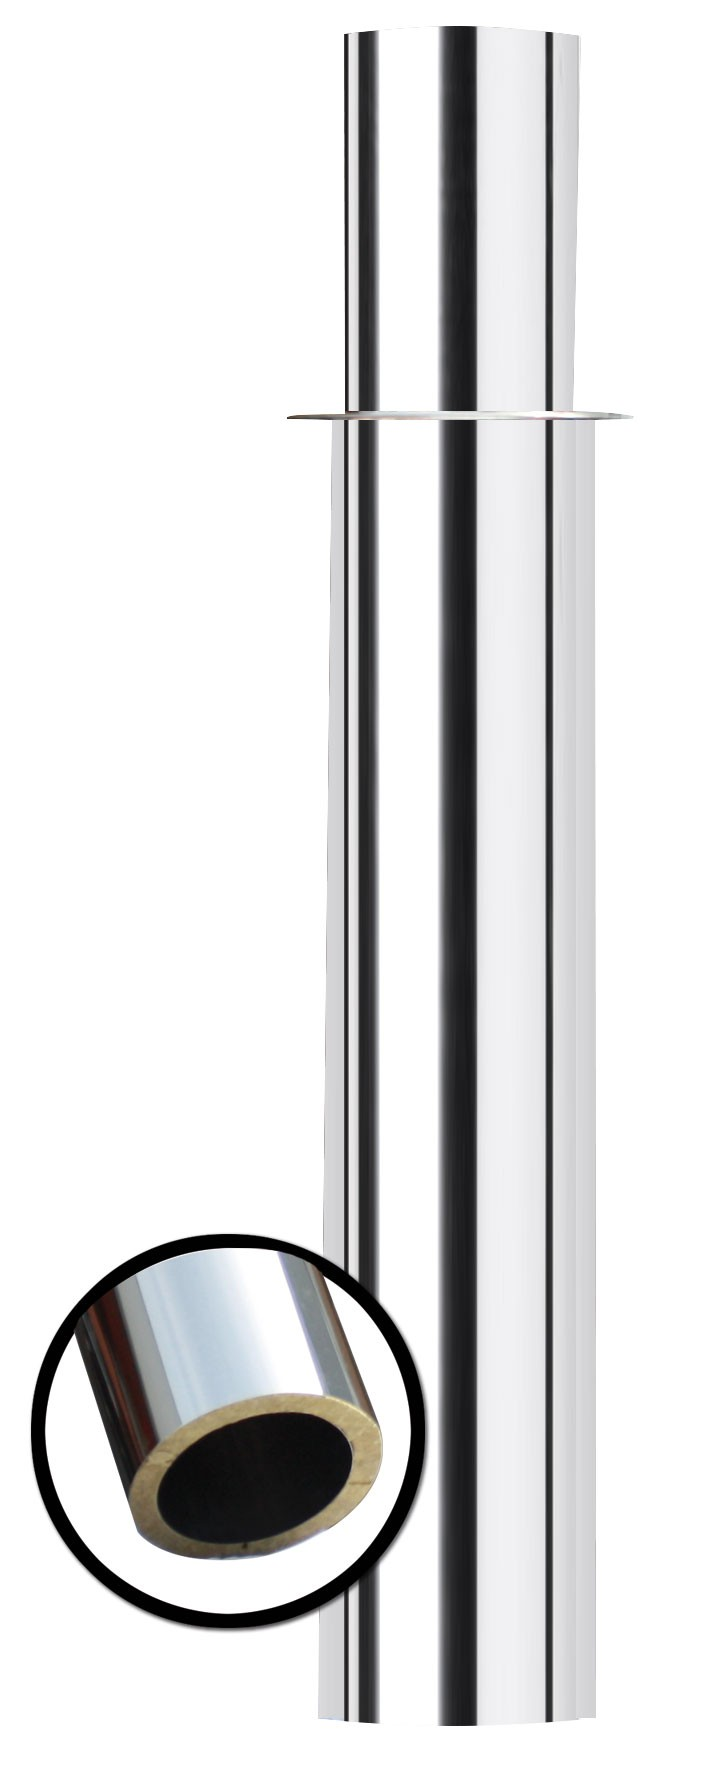 Verlängerungselement Edelstahl ohne Windkat 800mm Ø 160 mm Bild 1